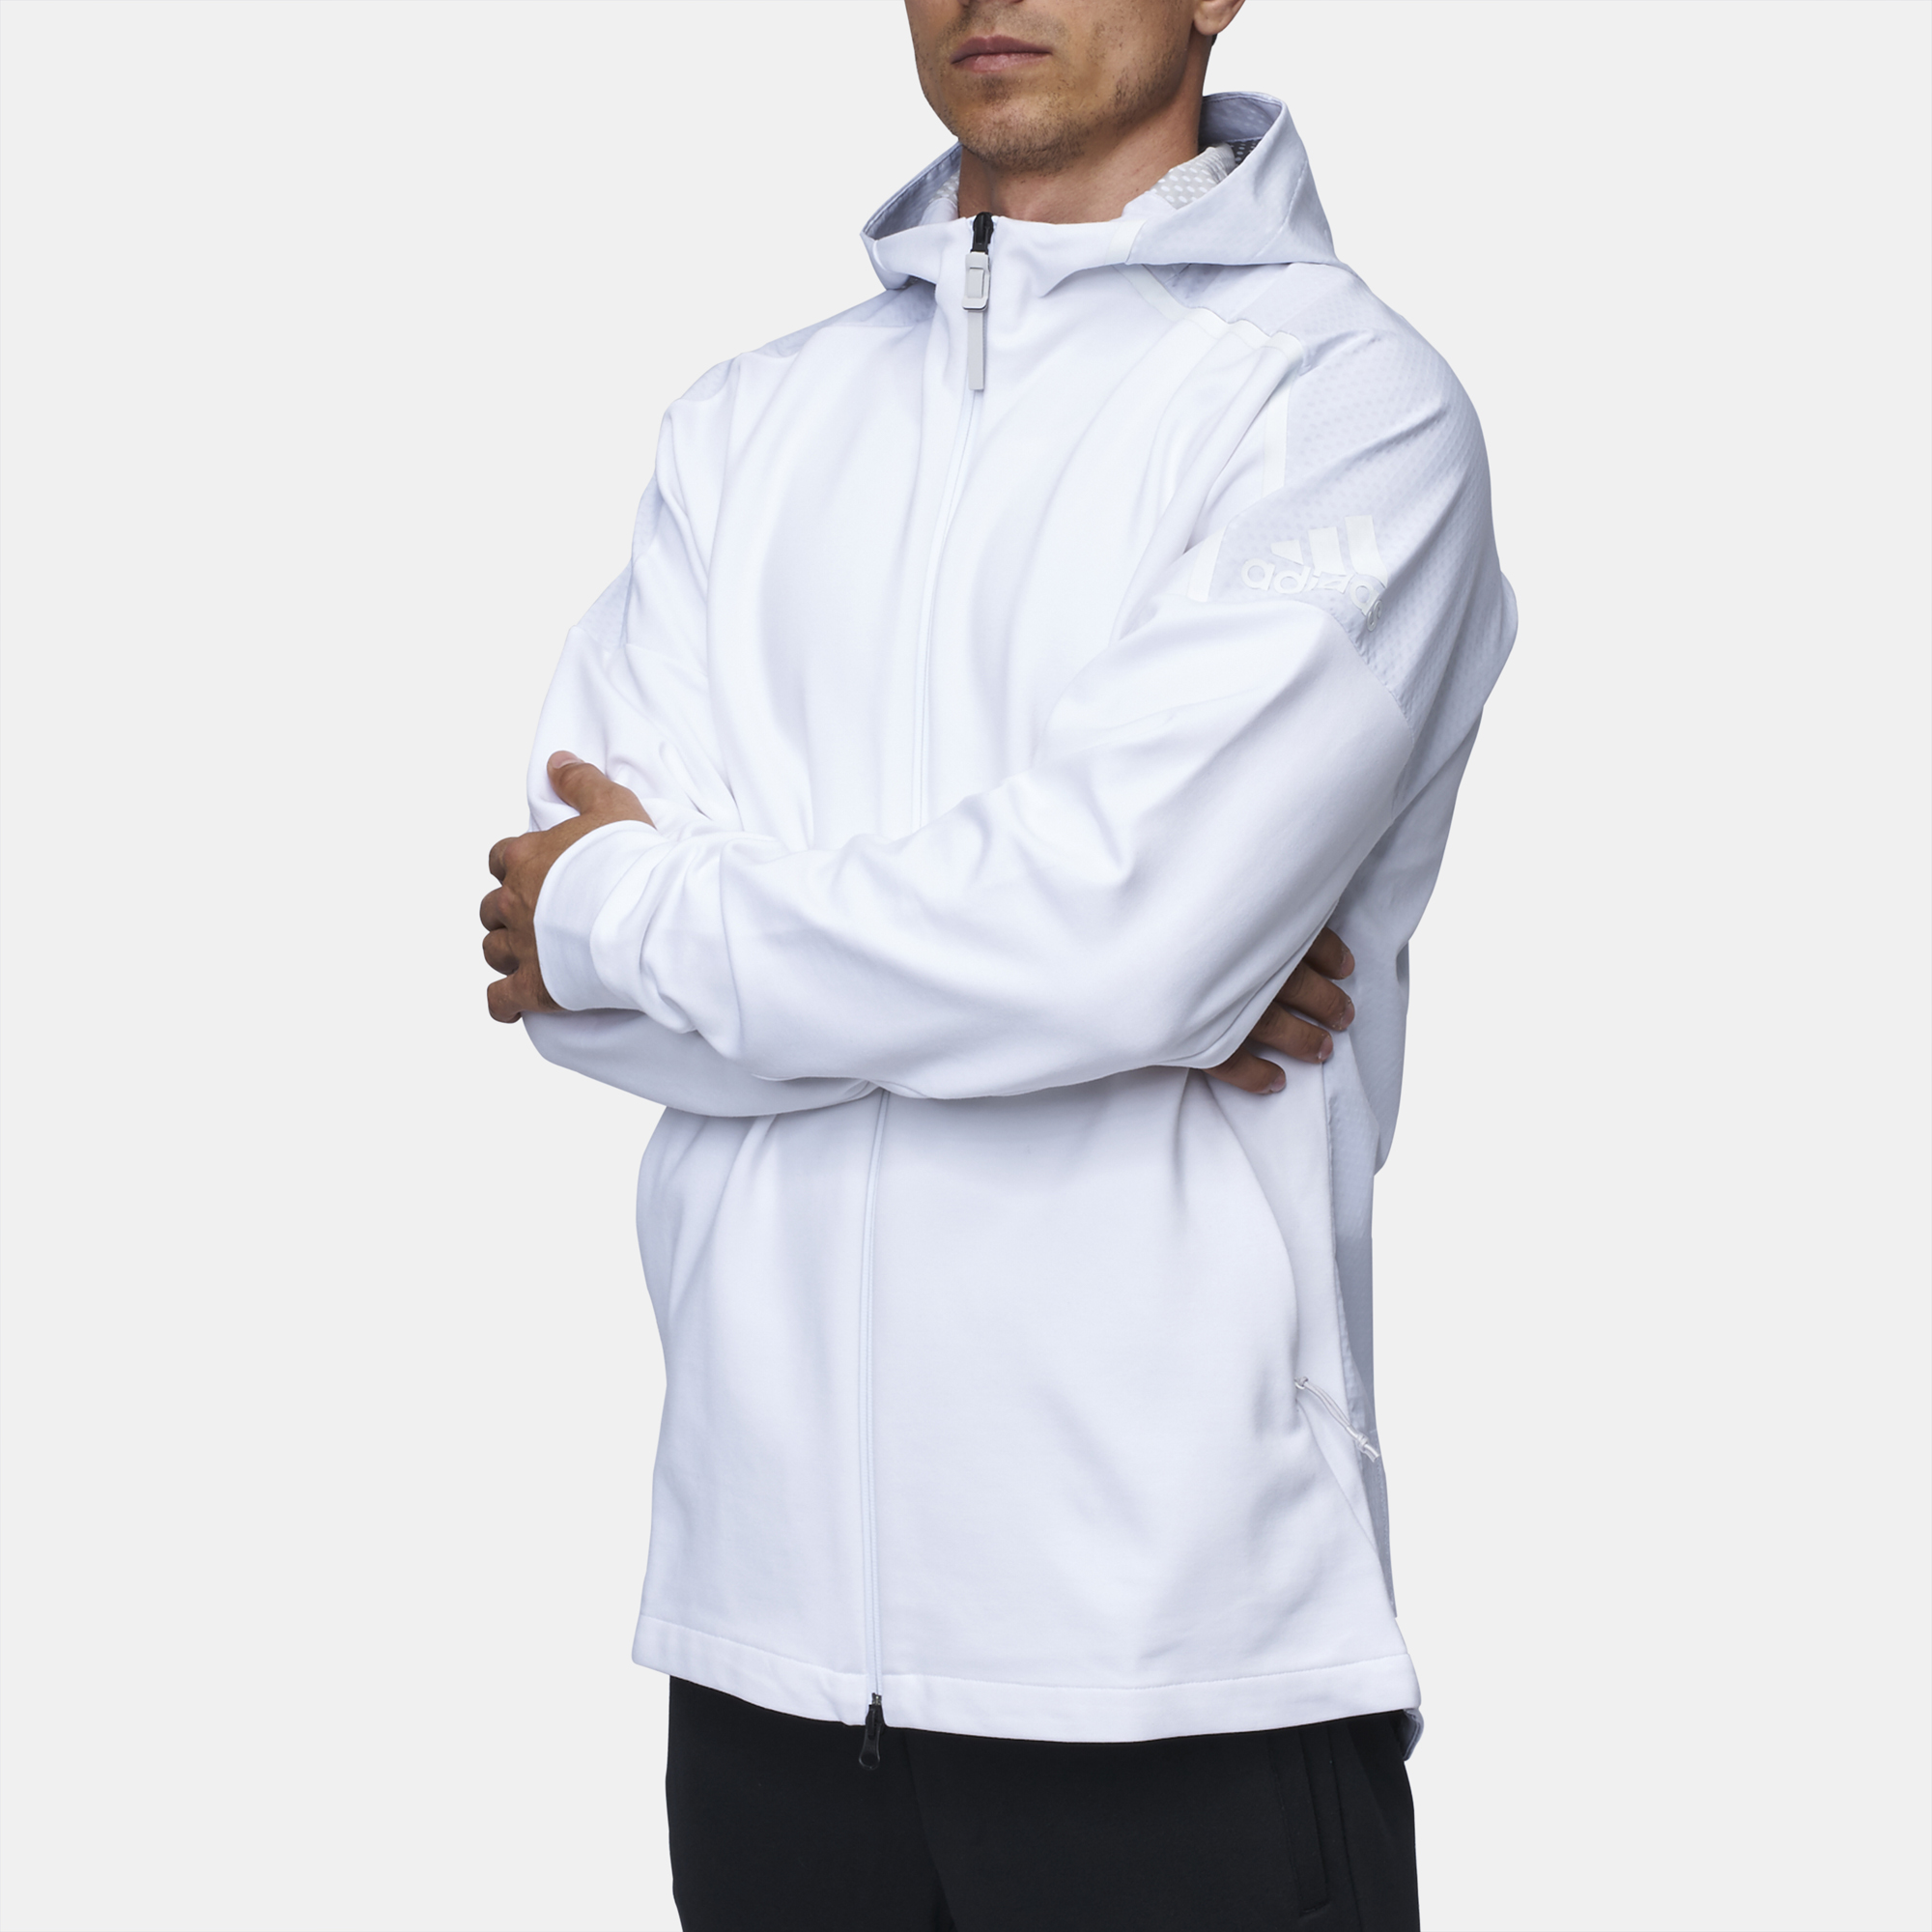 adidas ZNE Duo Hoodie | Hoodies | Hoodies and Sweatshirts